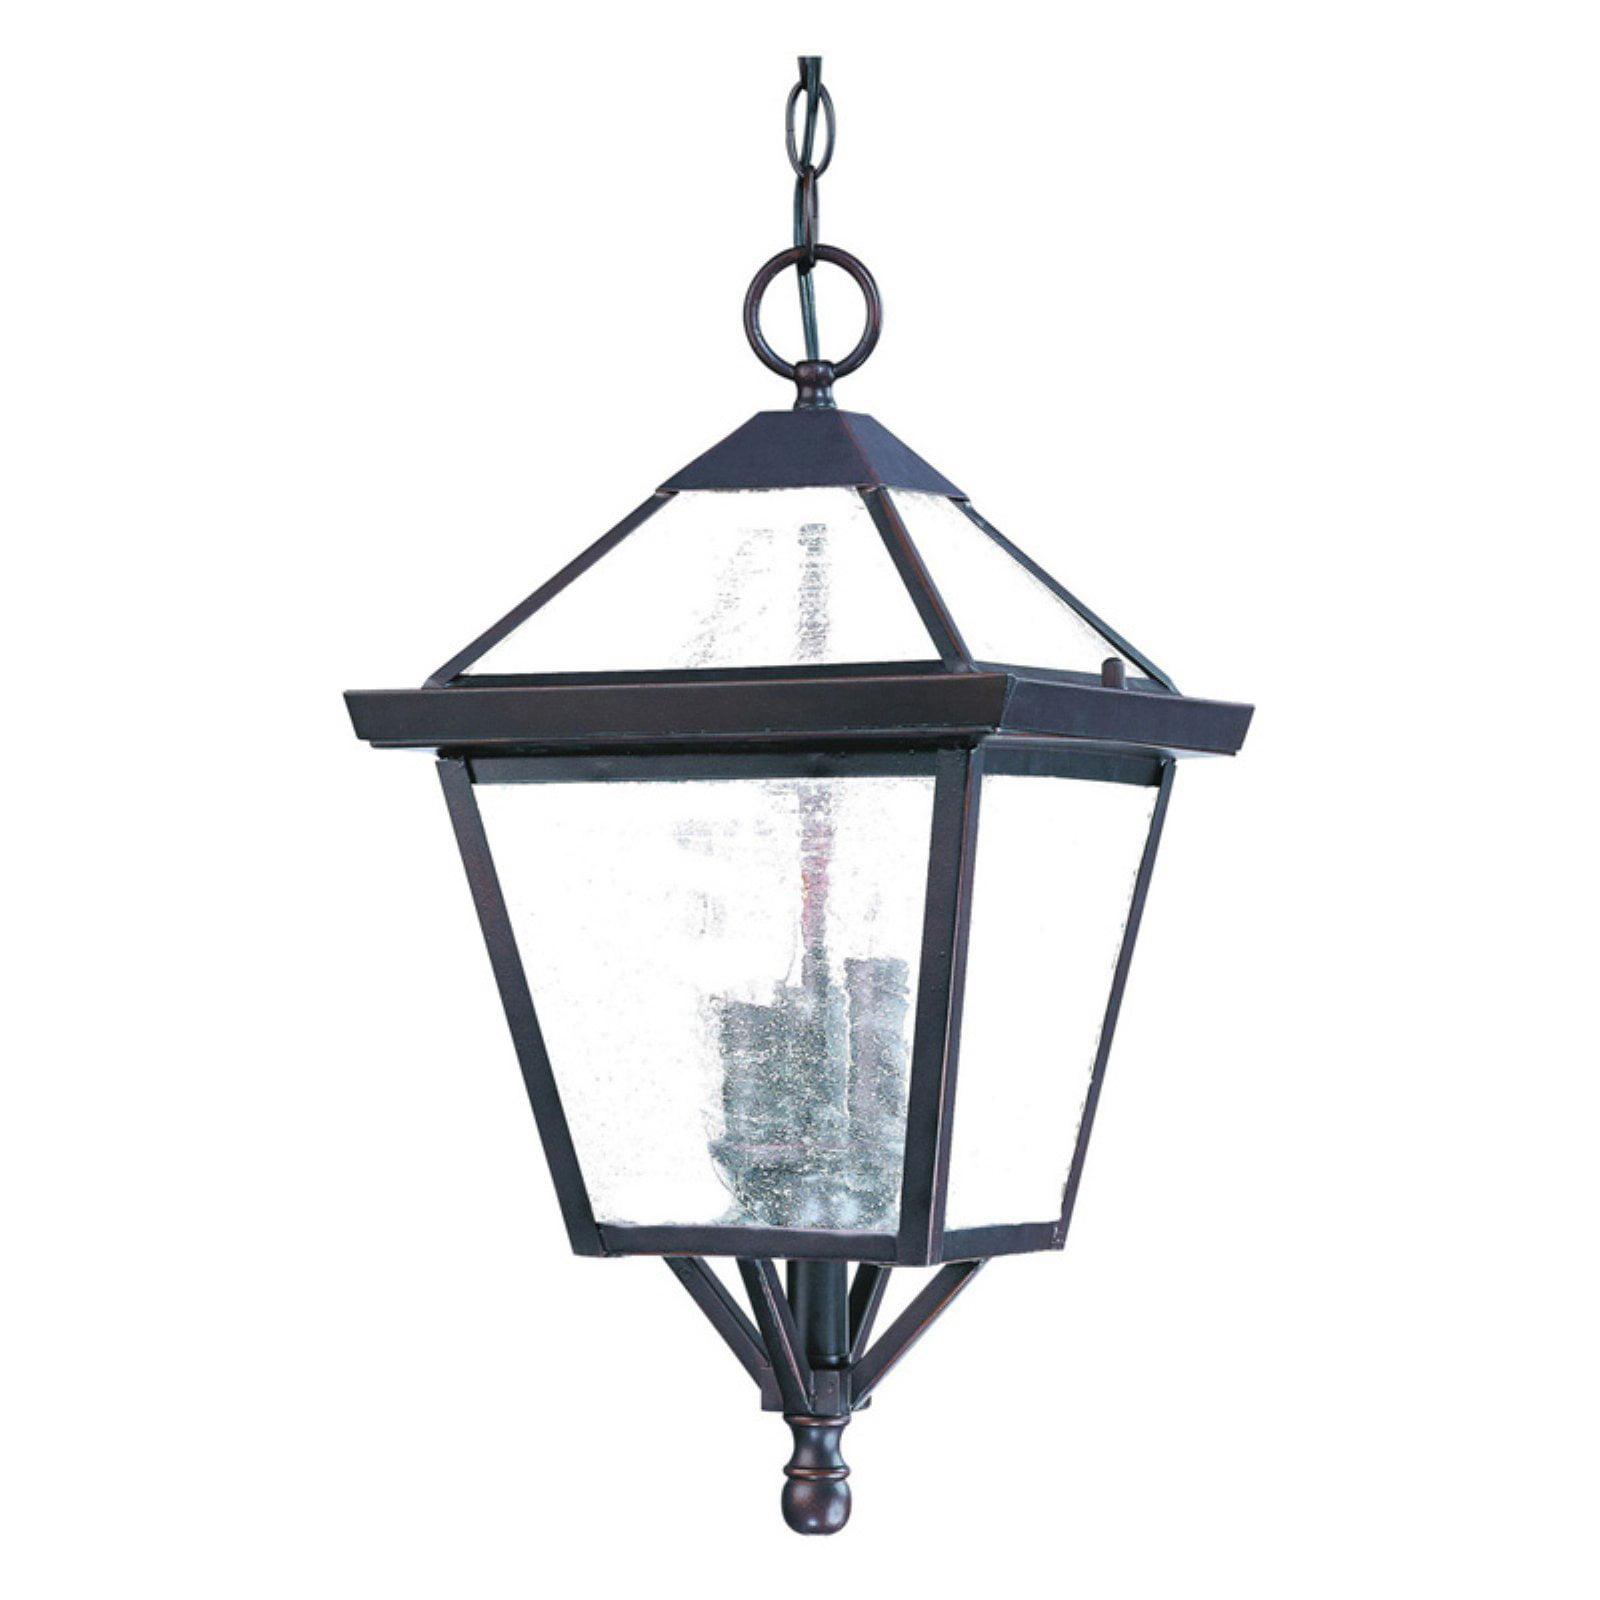 Acclaim Lighting Bay Street 3 Light Outdoor Hanging Lantern Light Fixture